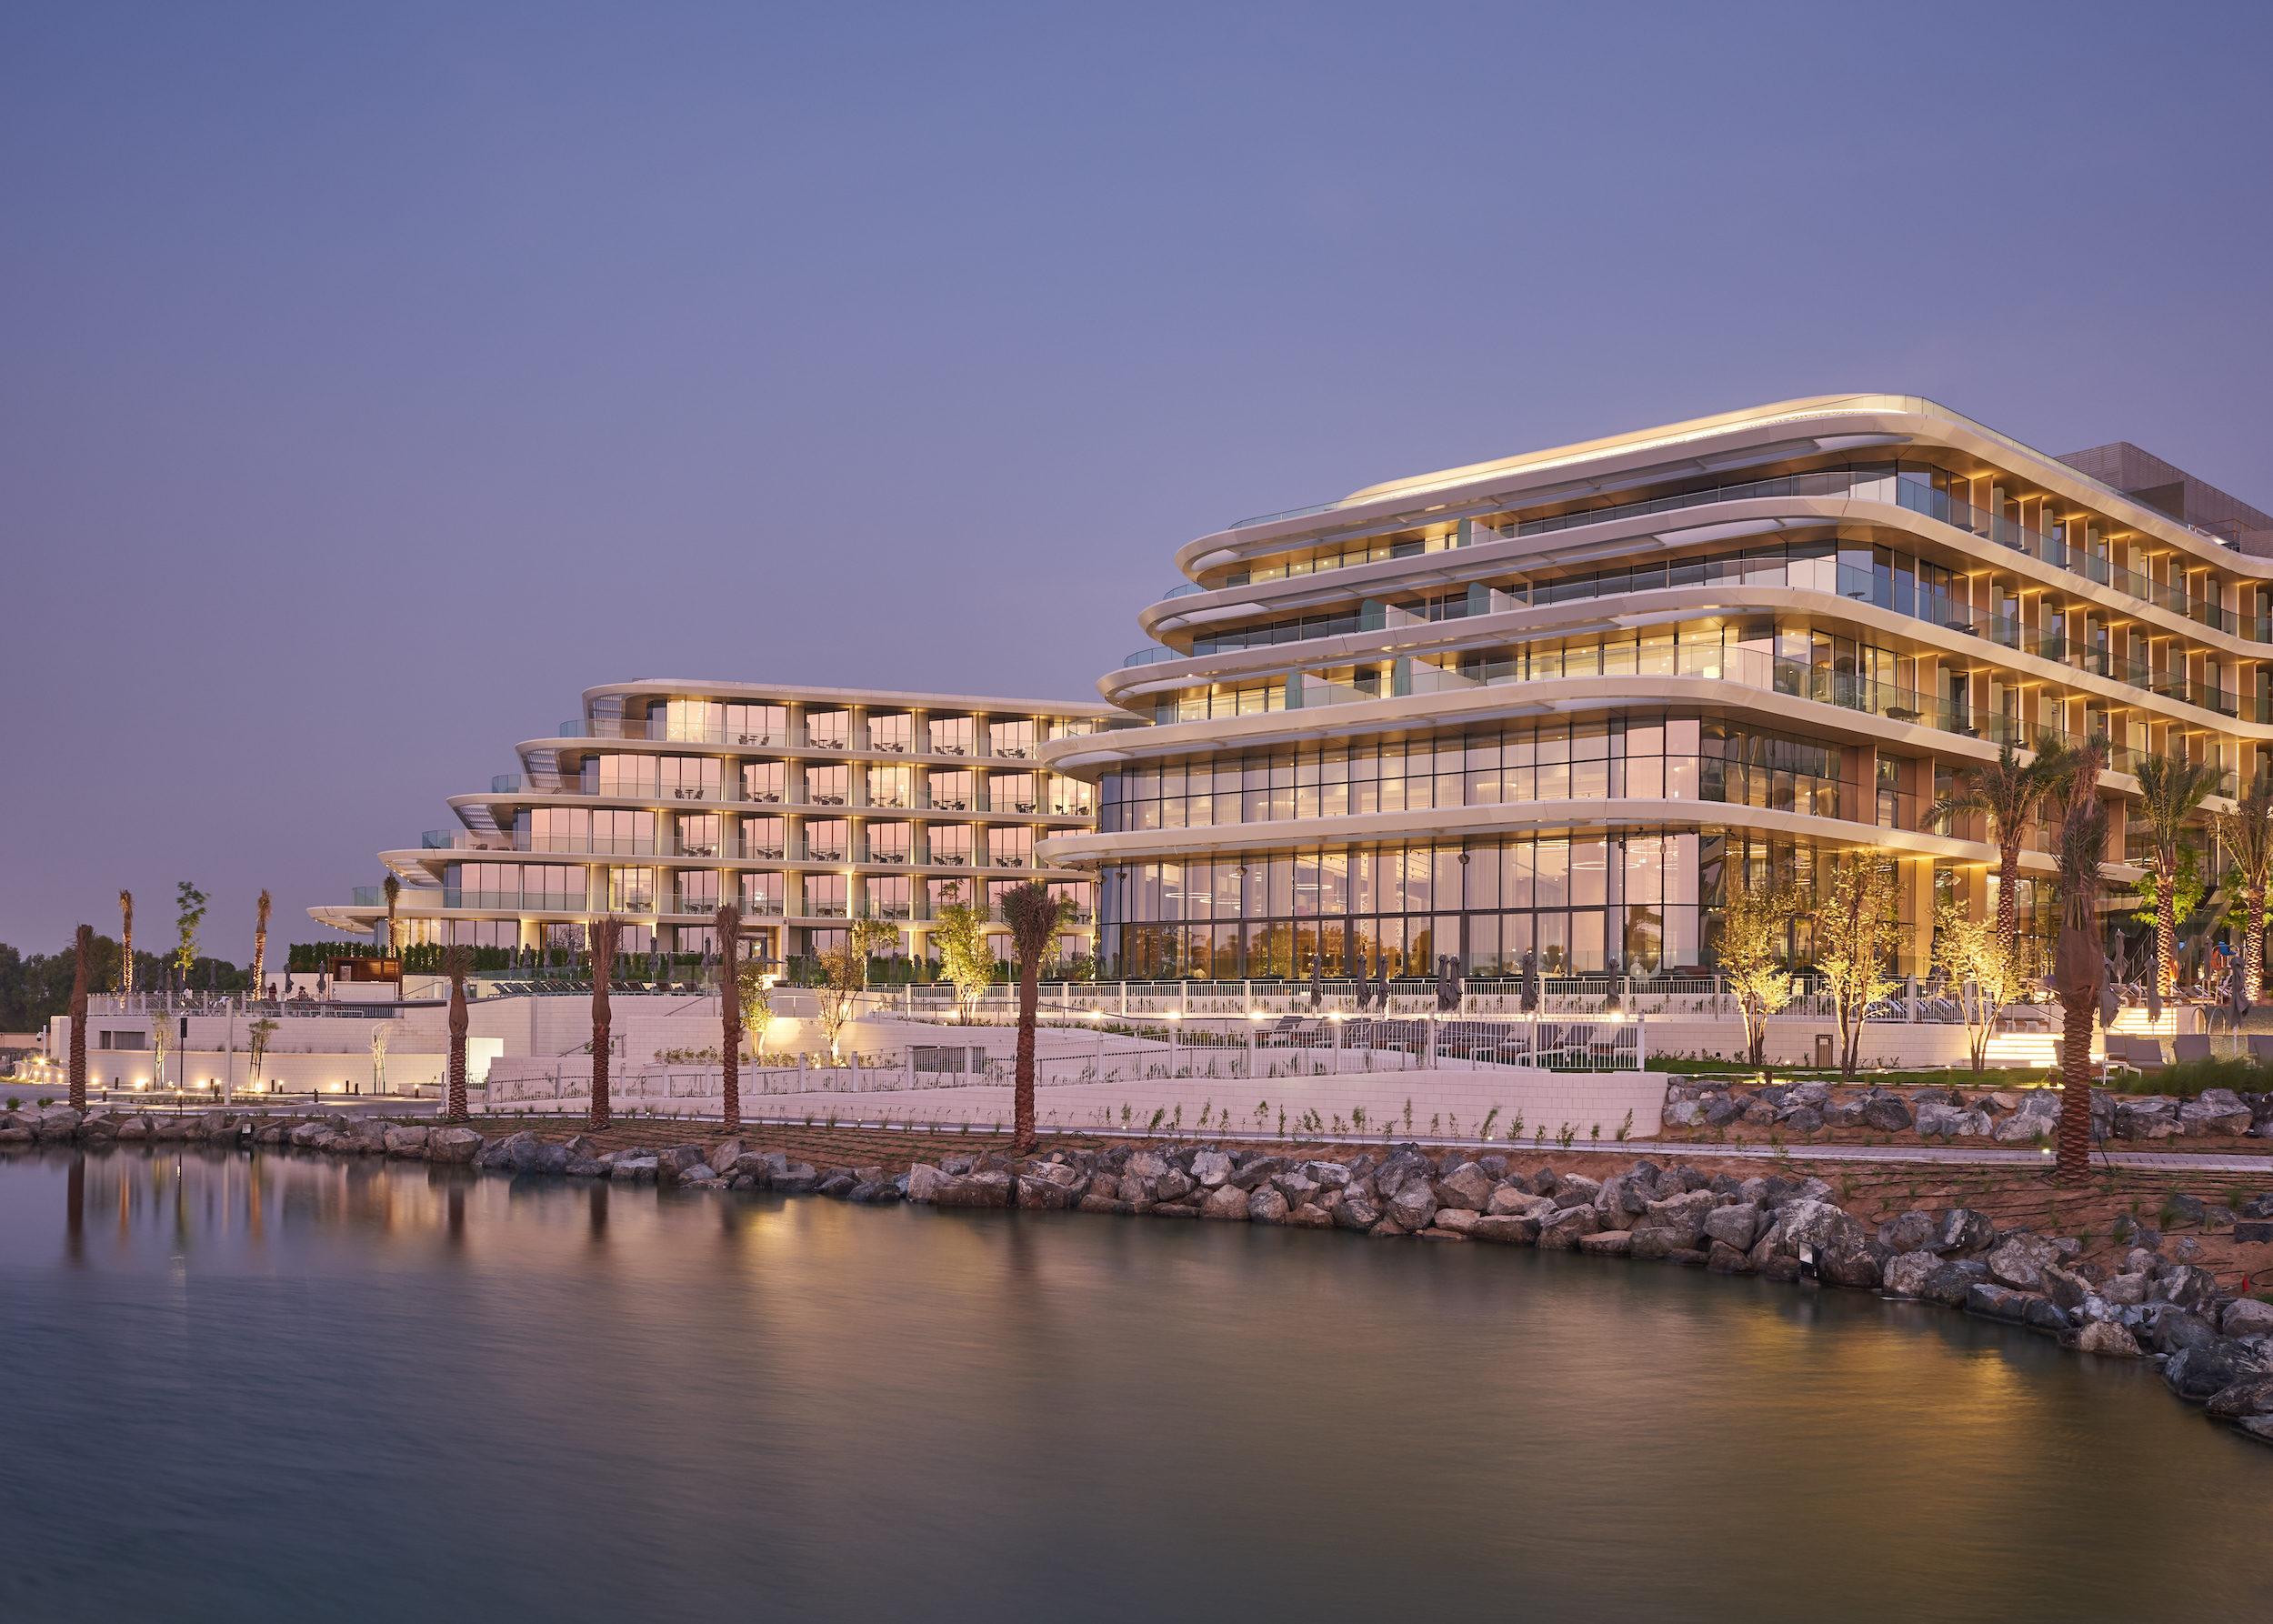 Hotel Dubai Architect